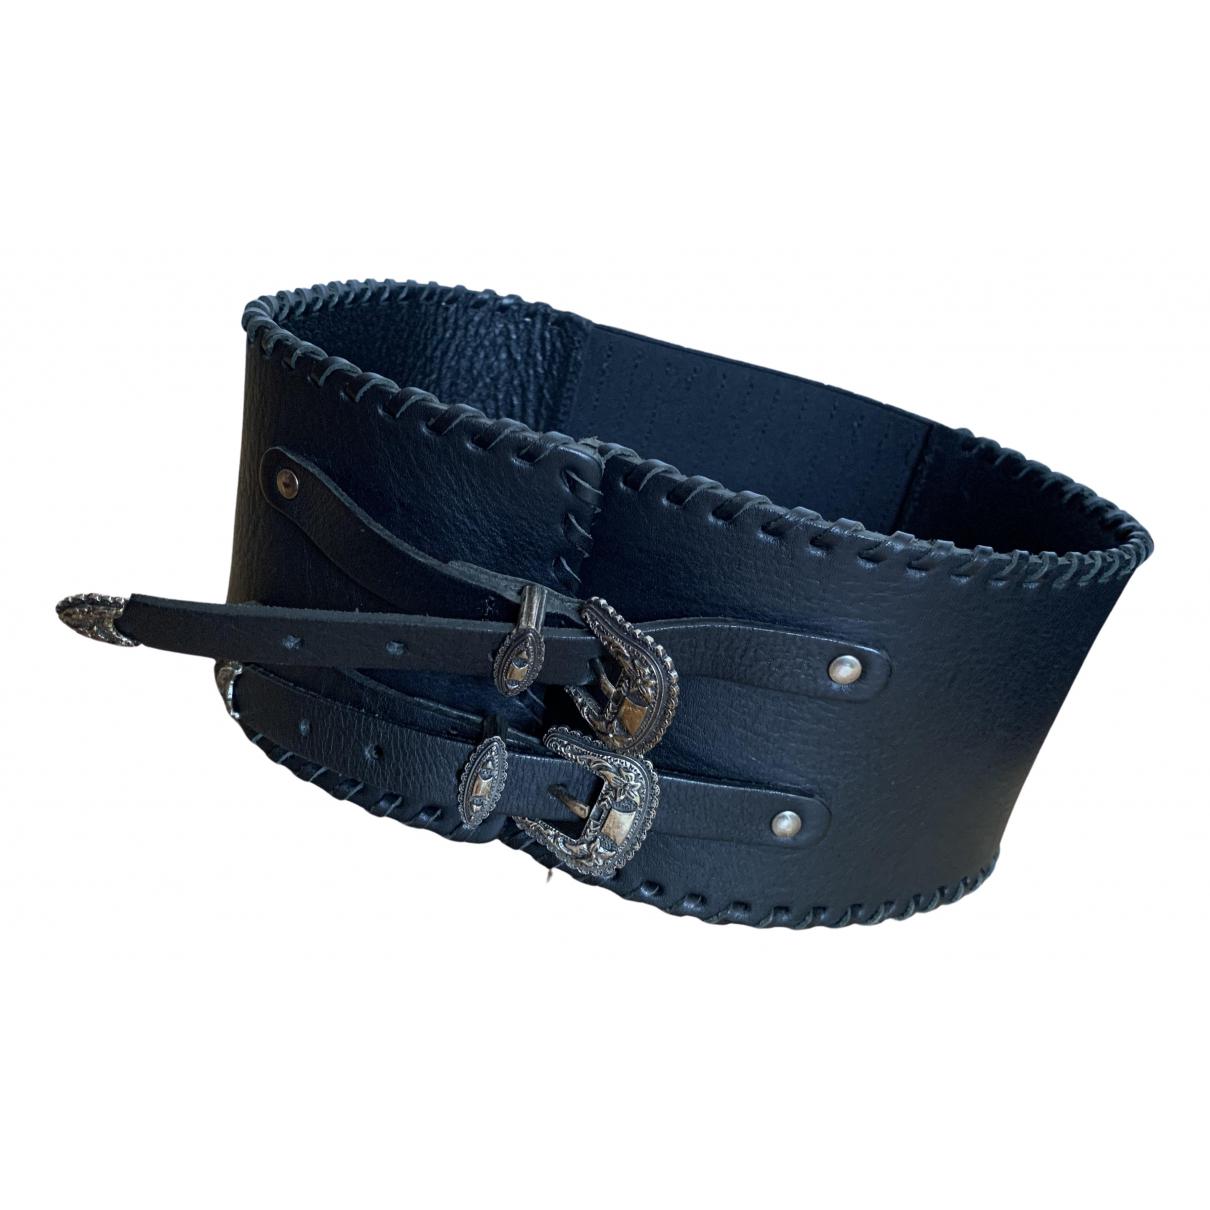 The Kooples \N Black Leather belt for Women S International